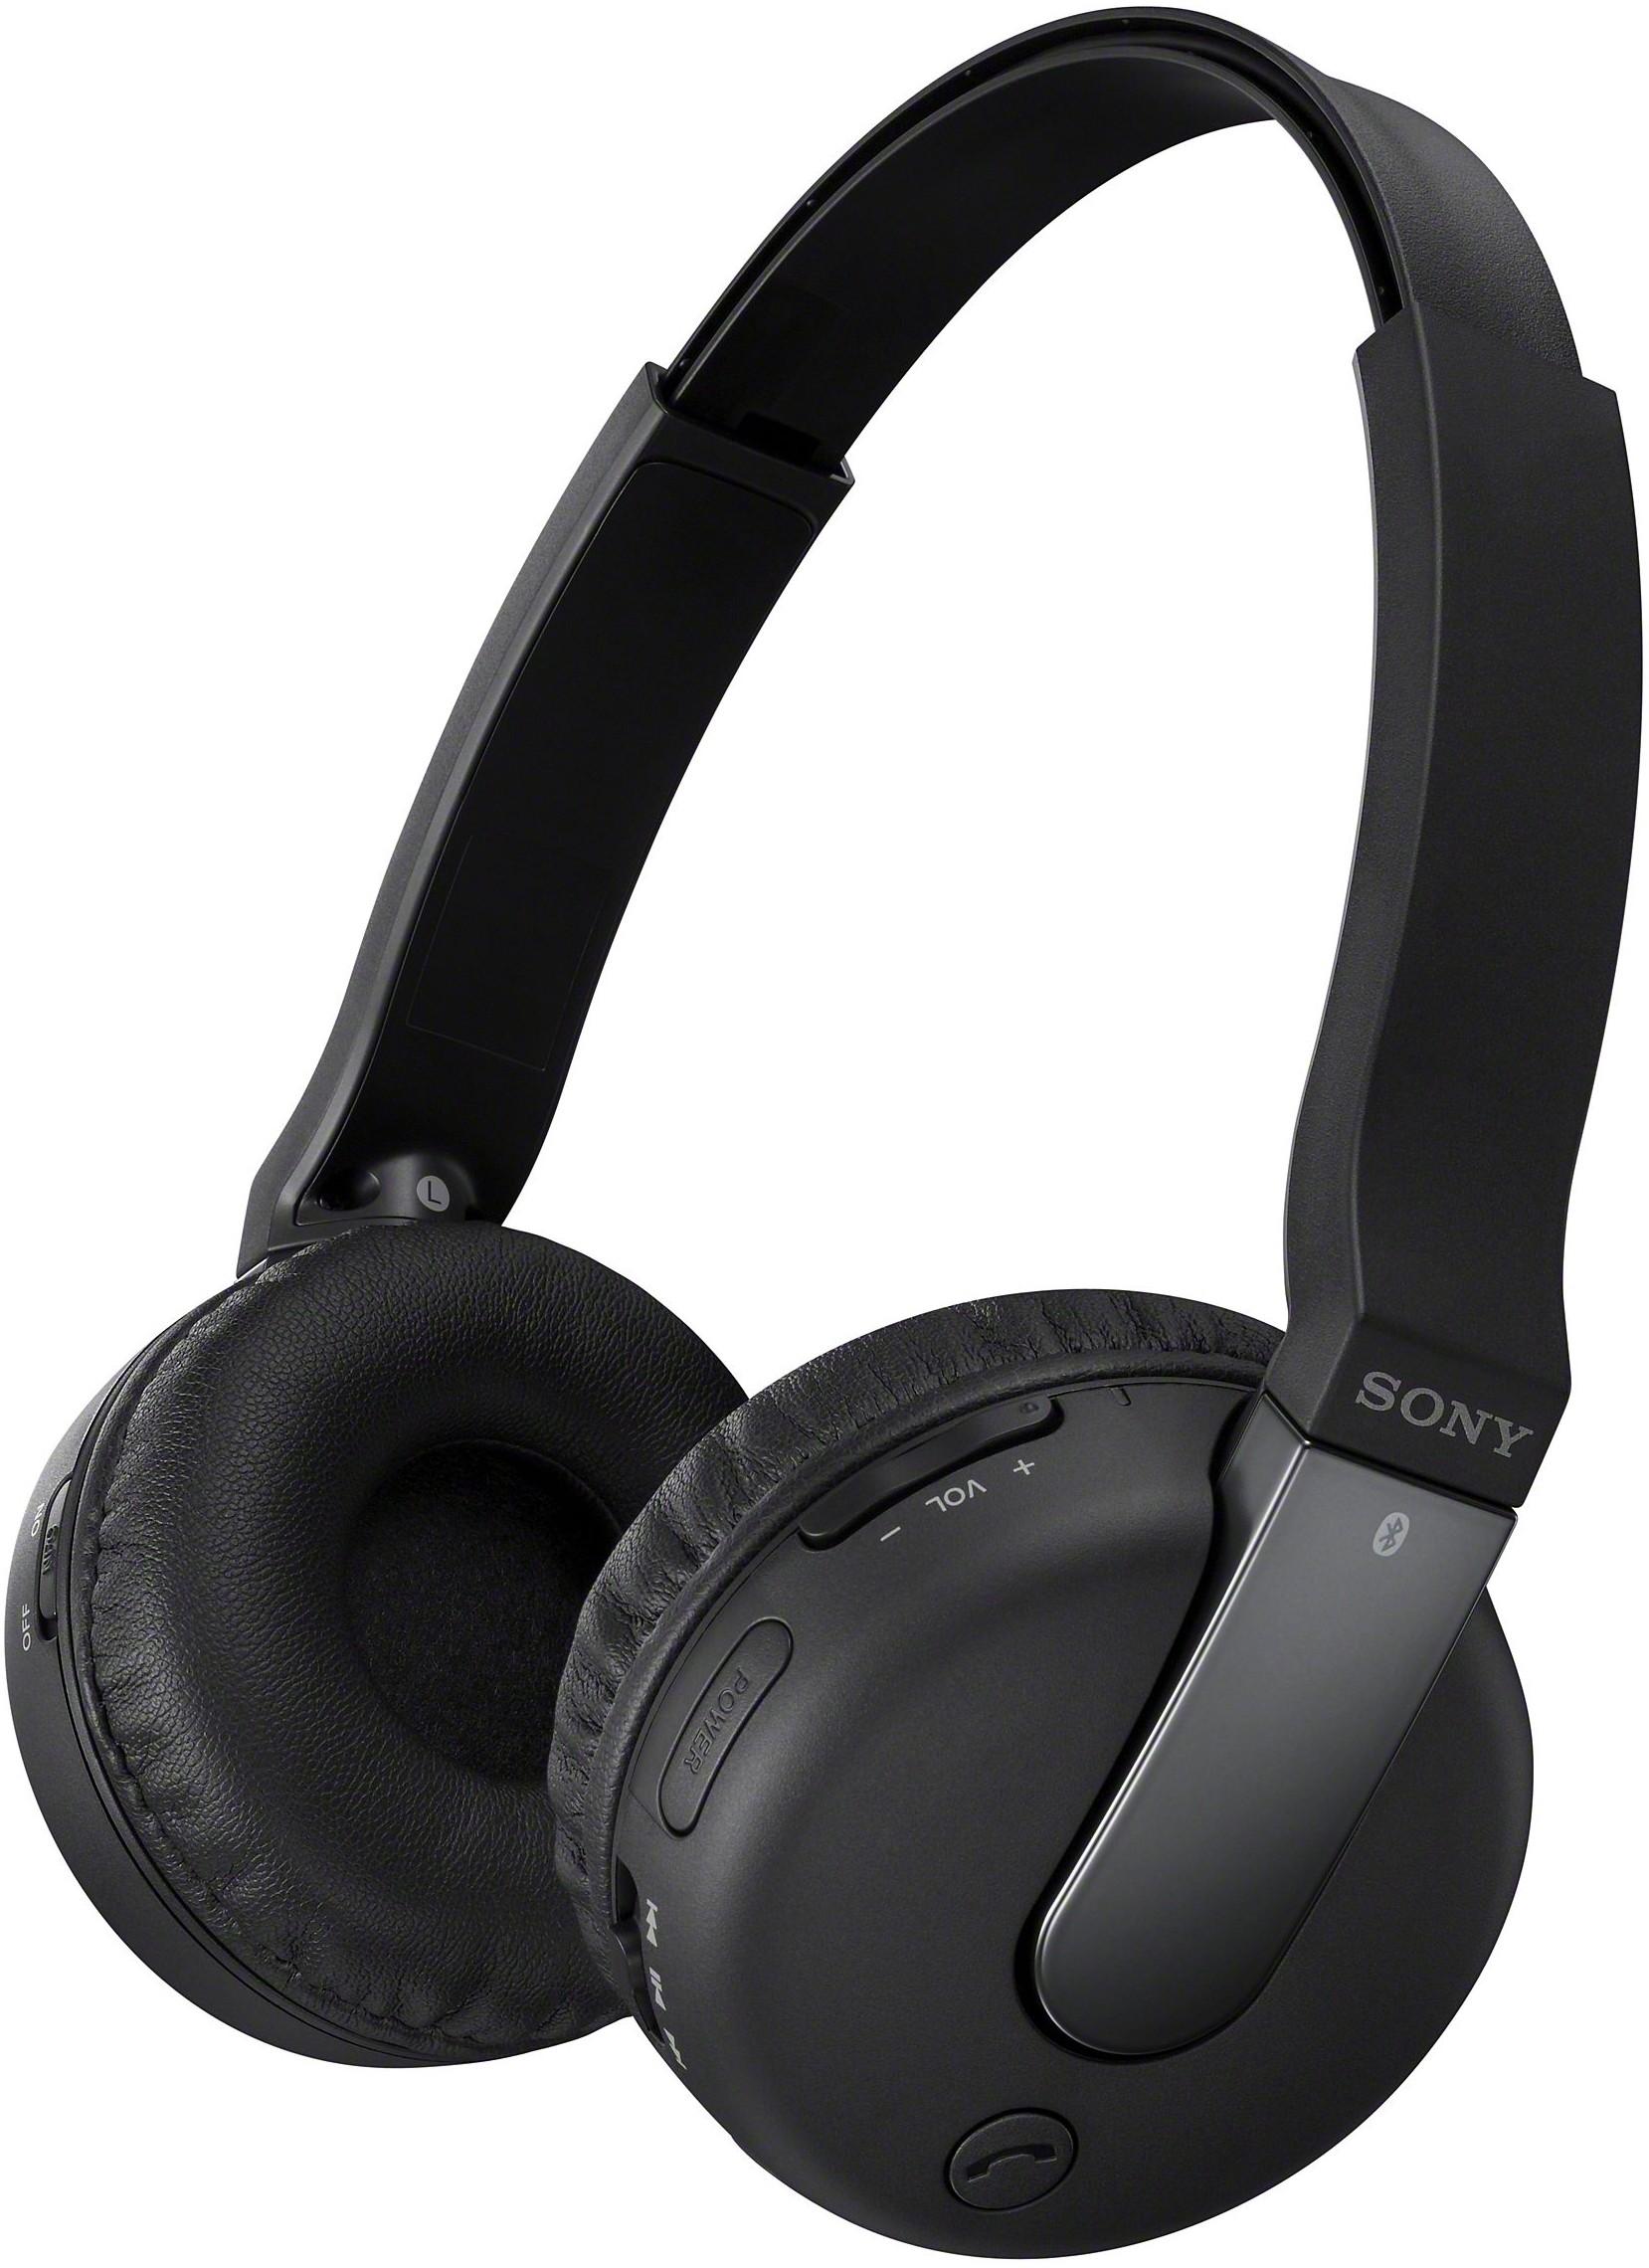 Sony DR-BTN200 BCE Wireless Headset With Mic(Black)